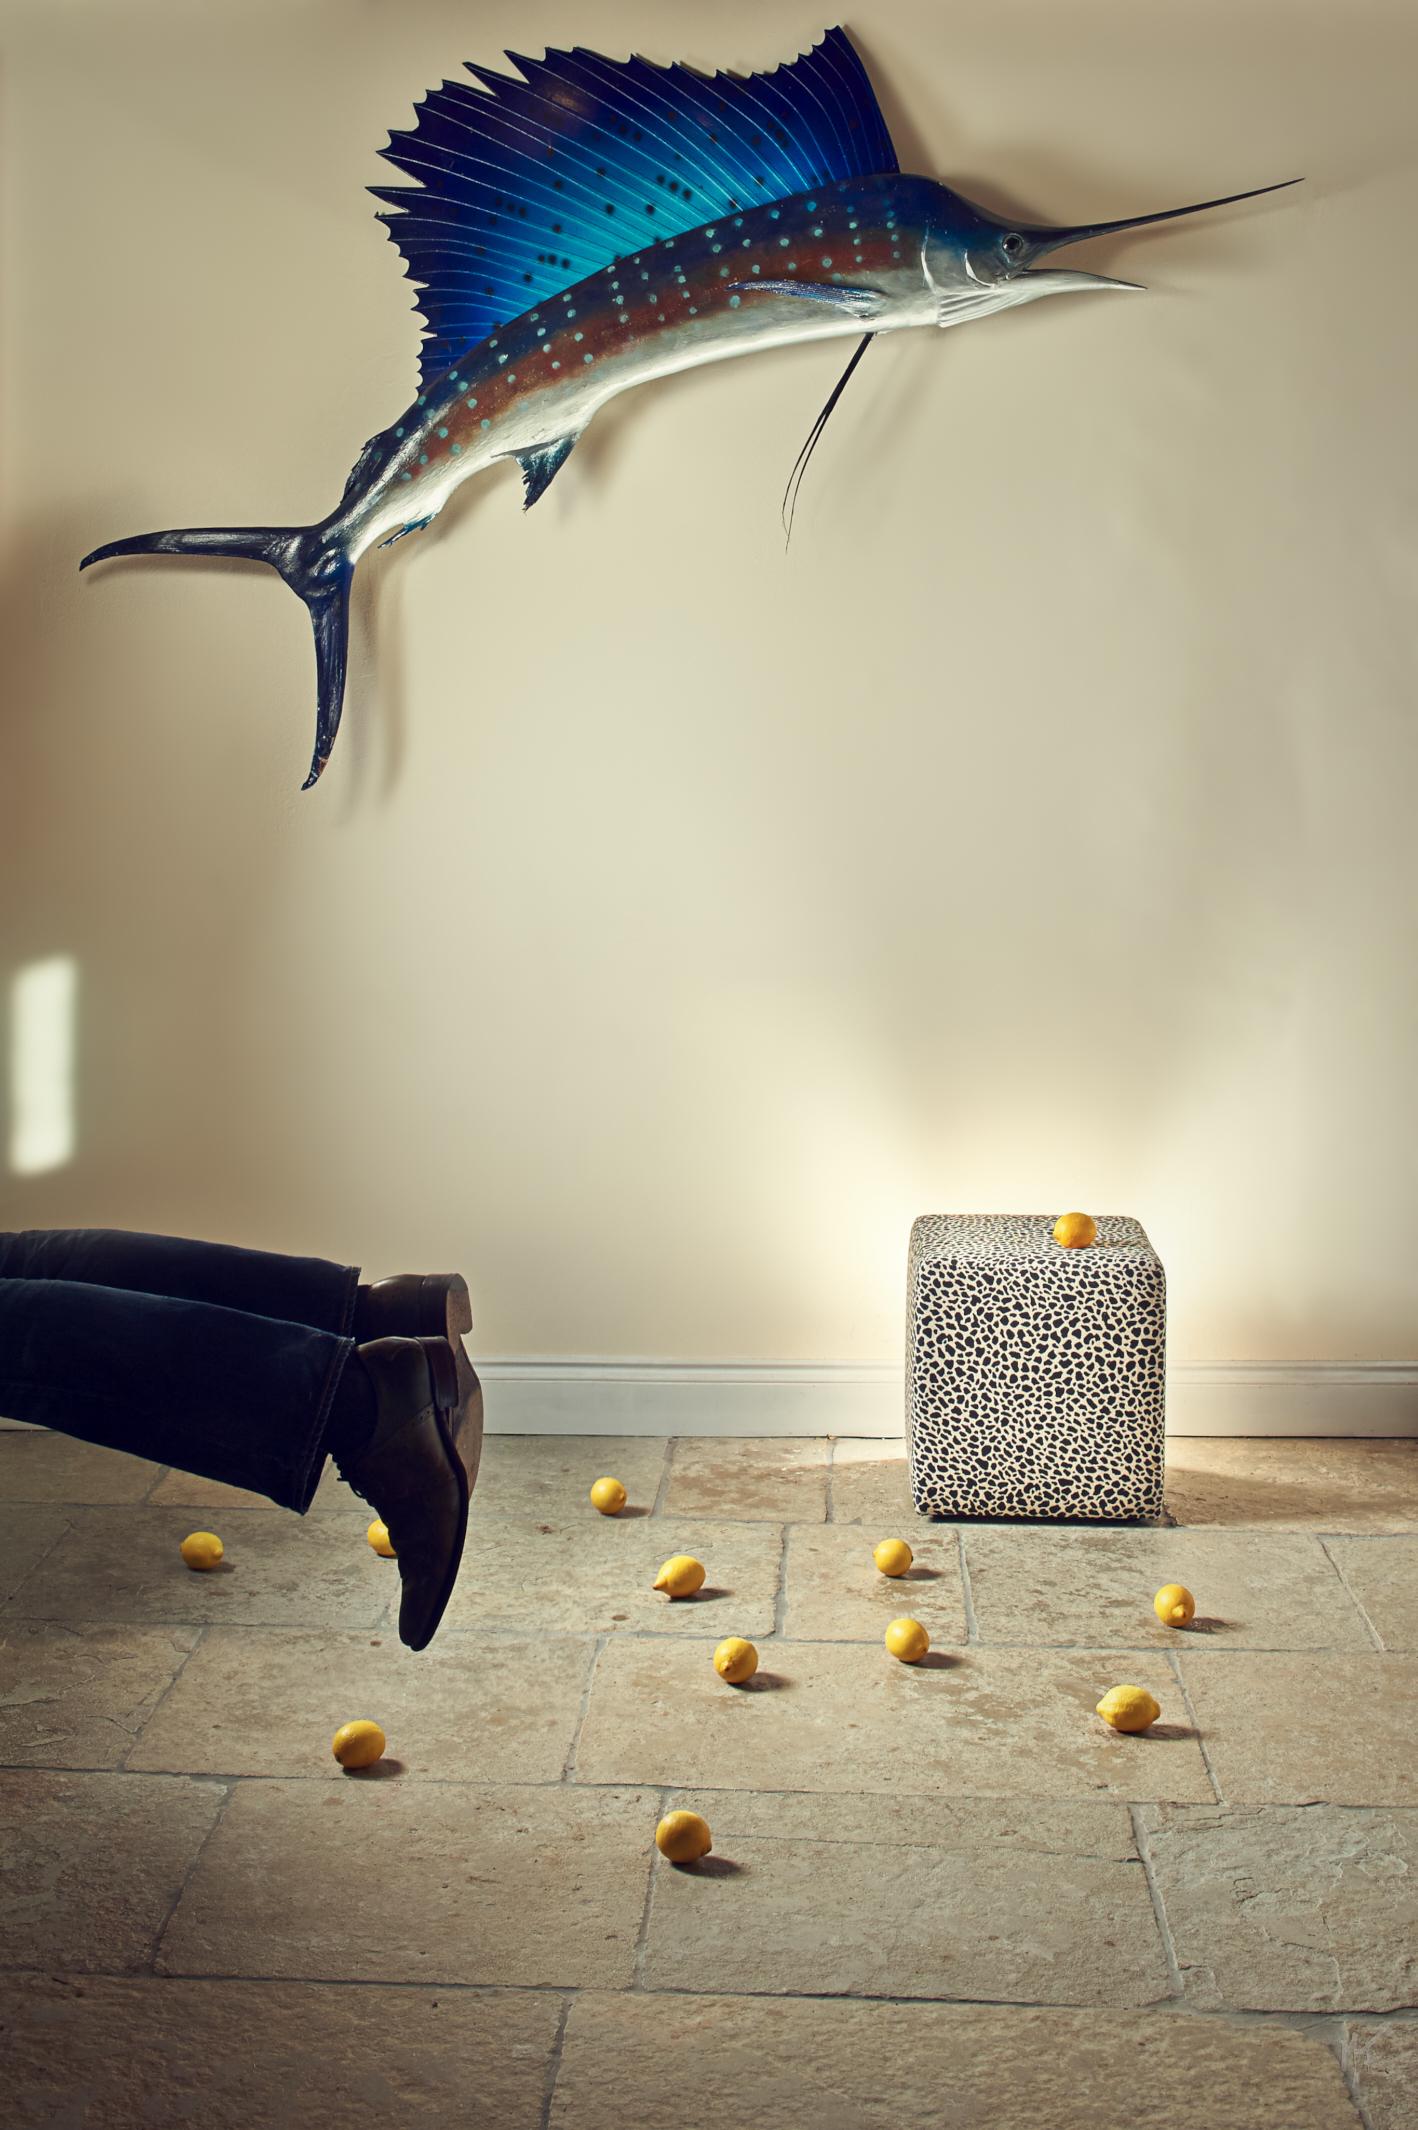 Photographer's portrait with sailfish and lemons